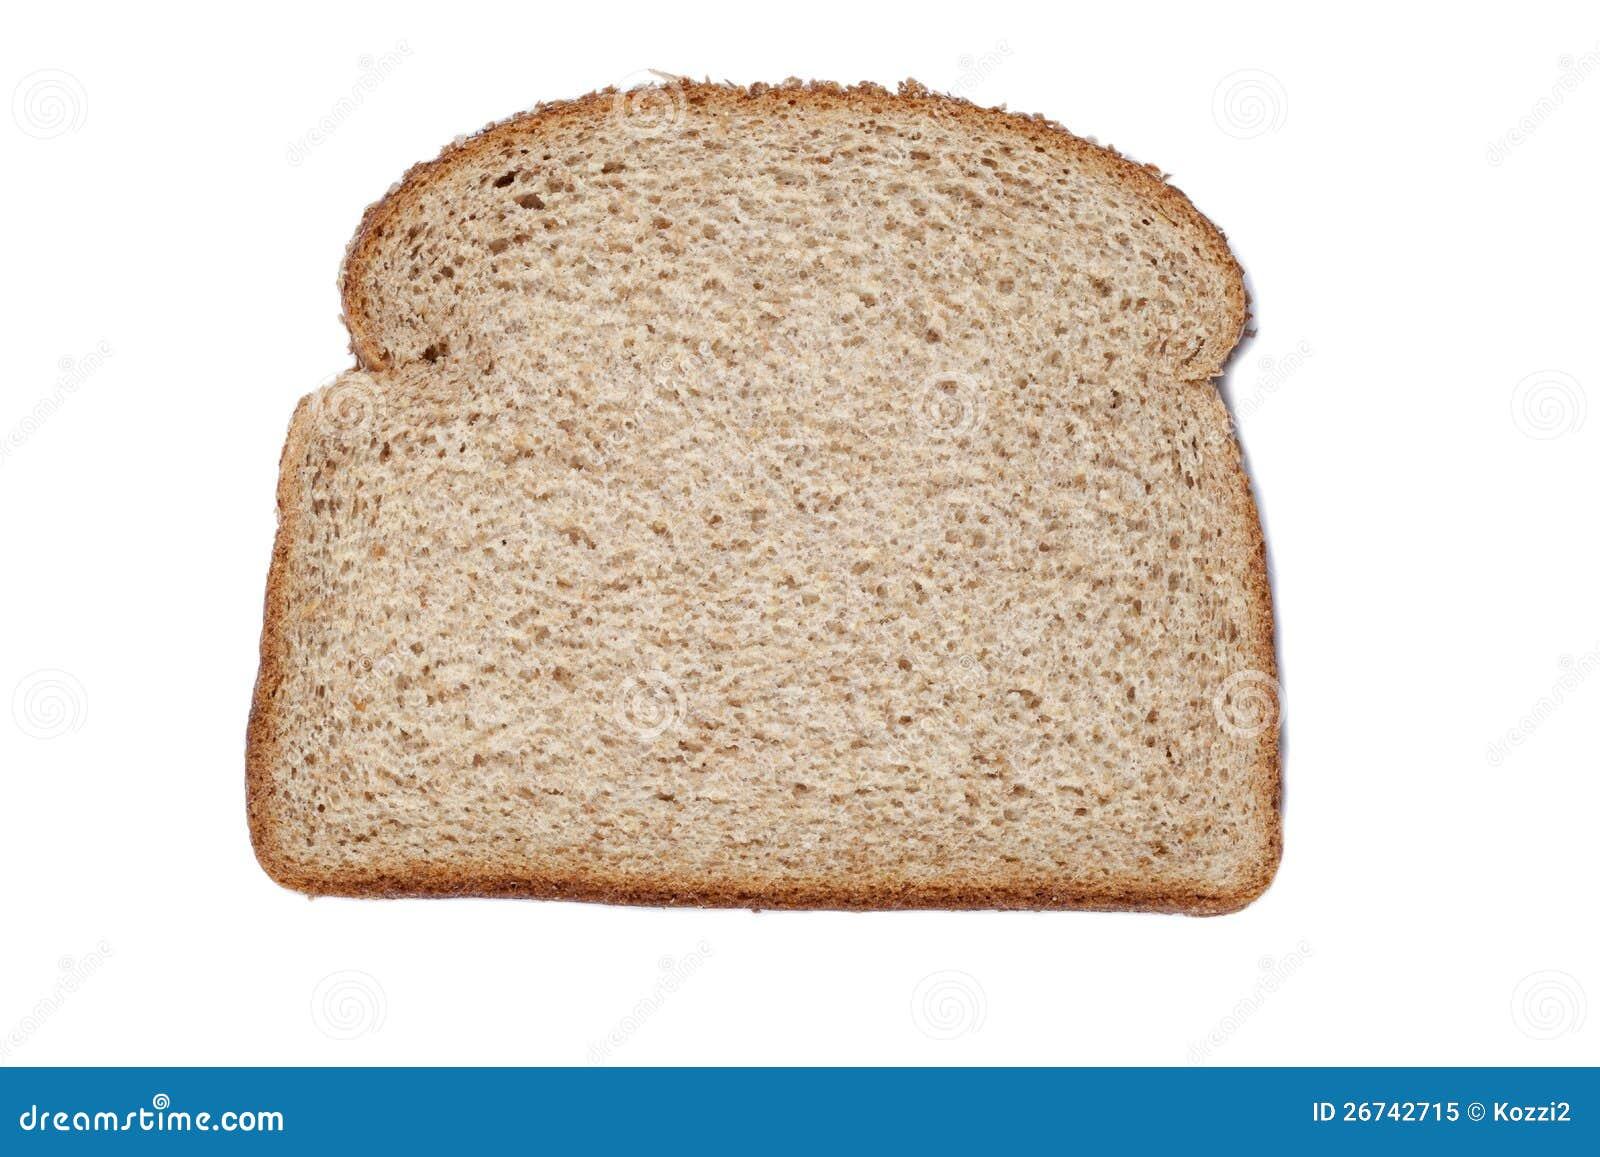 Animated bread slice